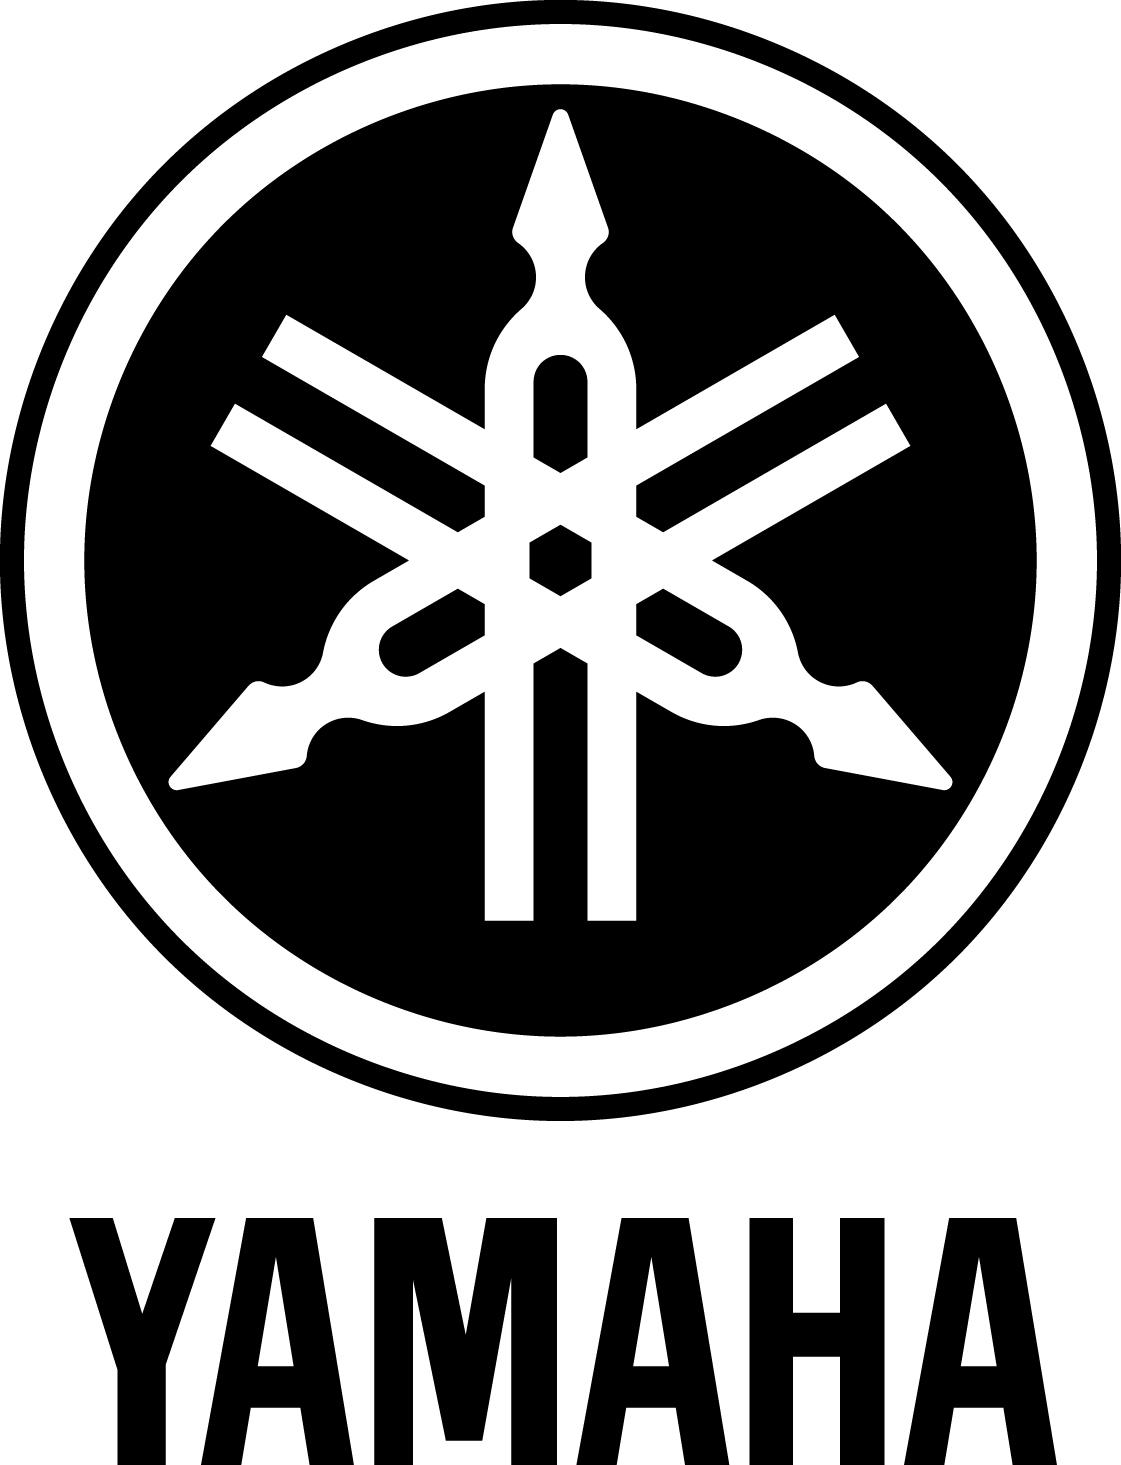 de yamaha mt 07 naked bikes motor forum yamaha logo svg yamaha logo sticker